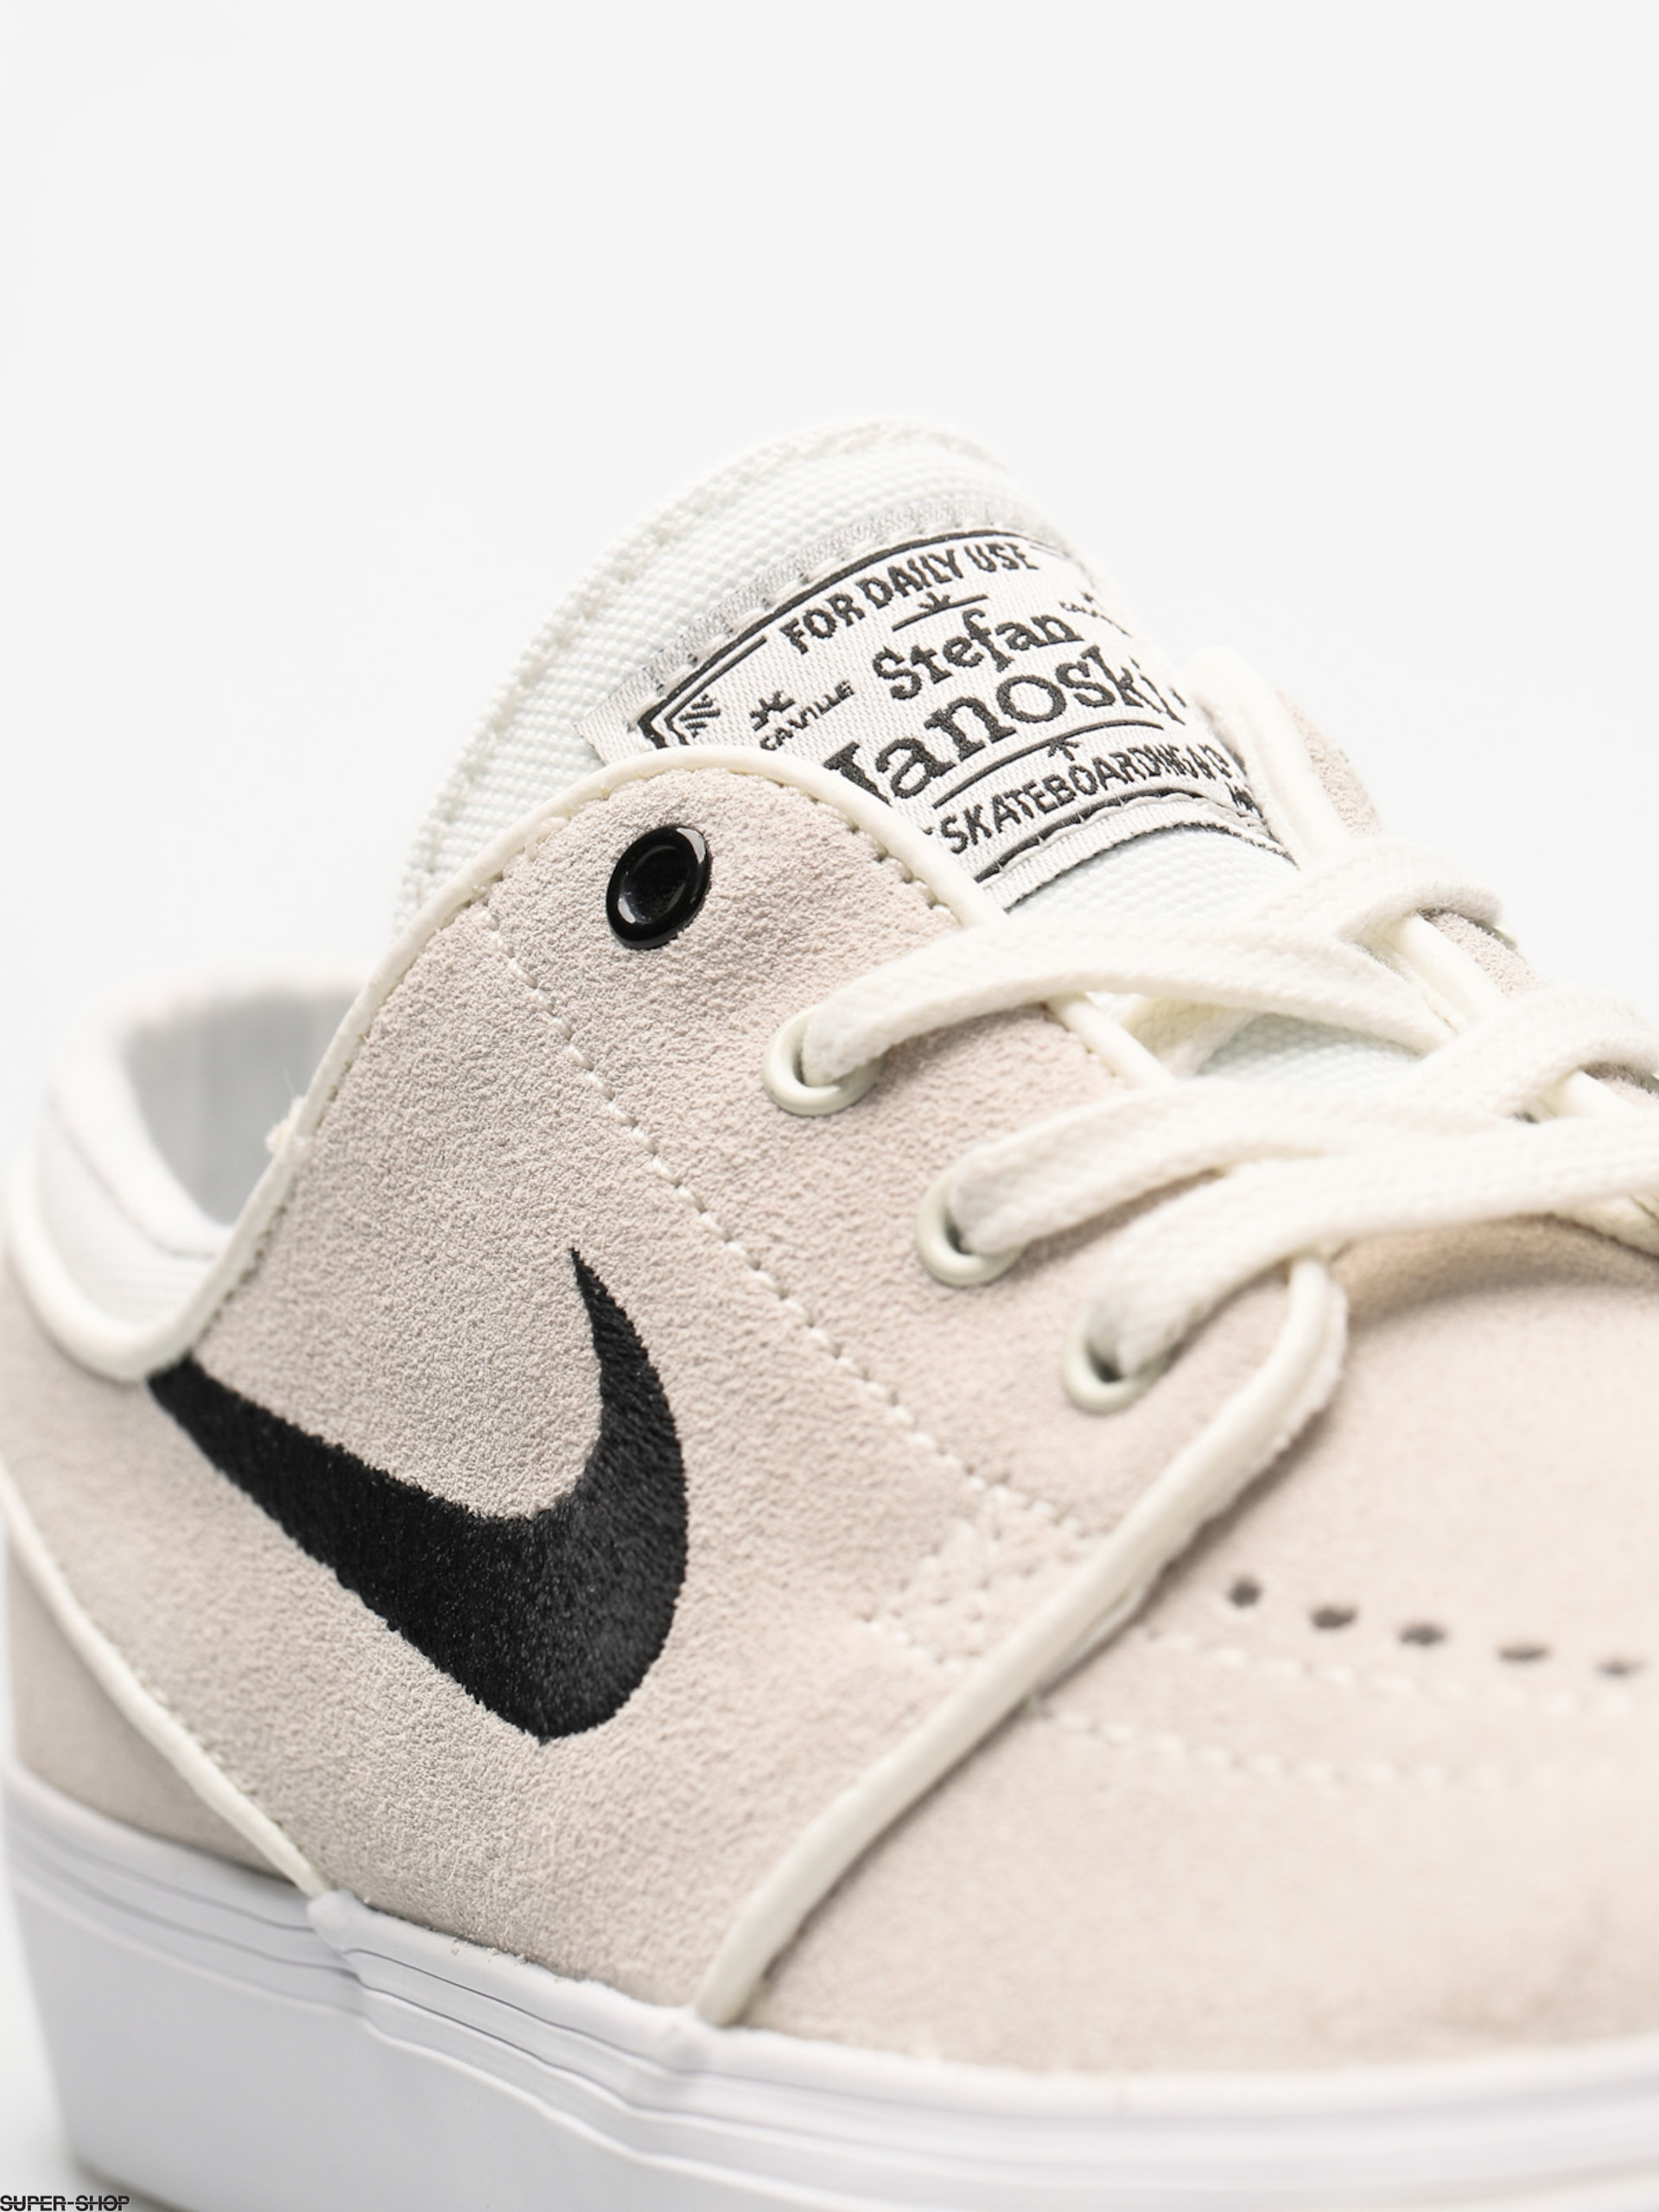 best authentic 6c4ae f62e0 Nike SB Shoes Zoom Stefan Janoski (summit white black white pure platinum)